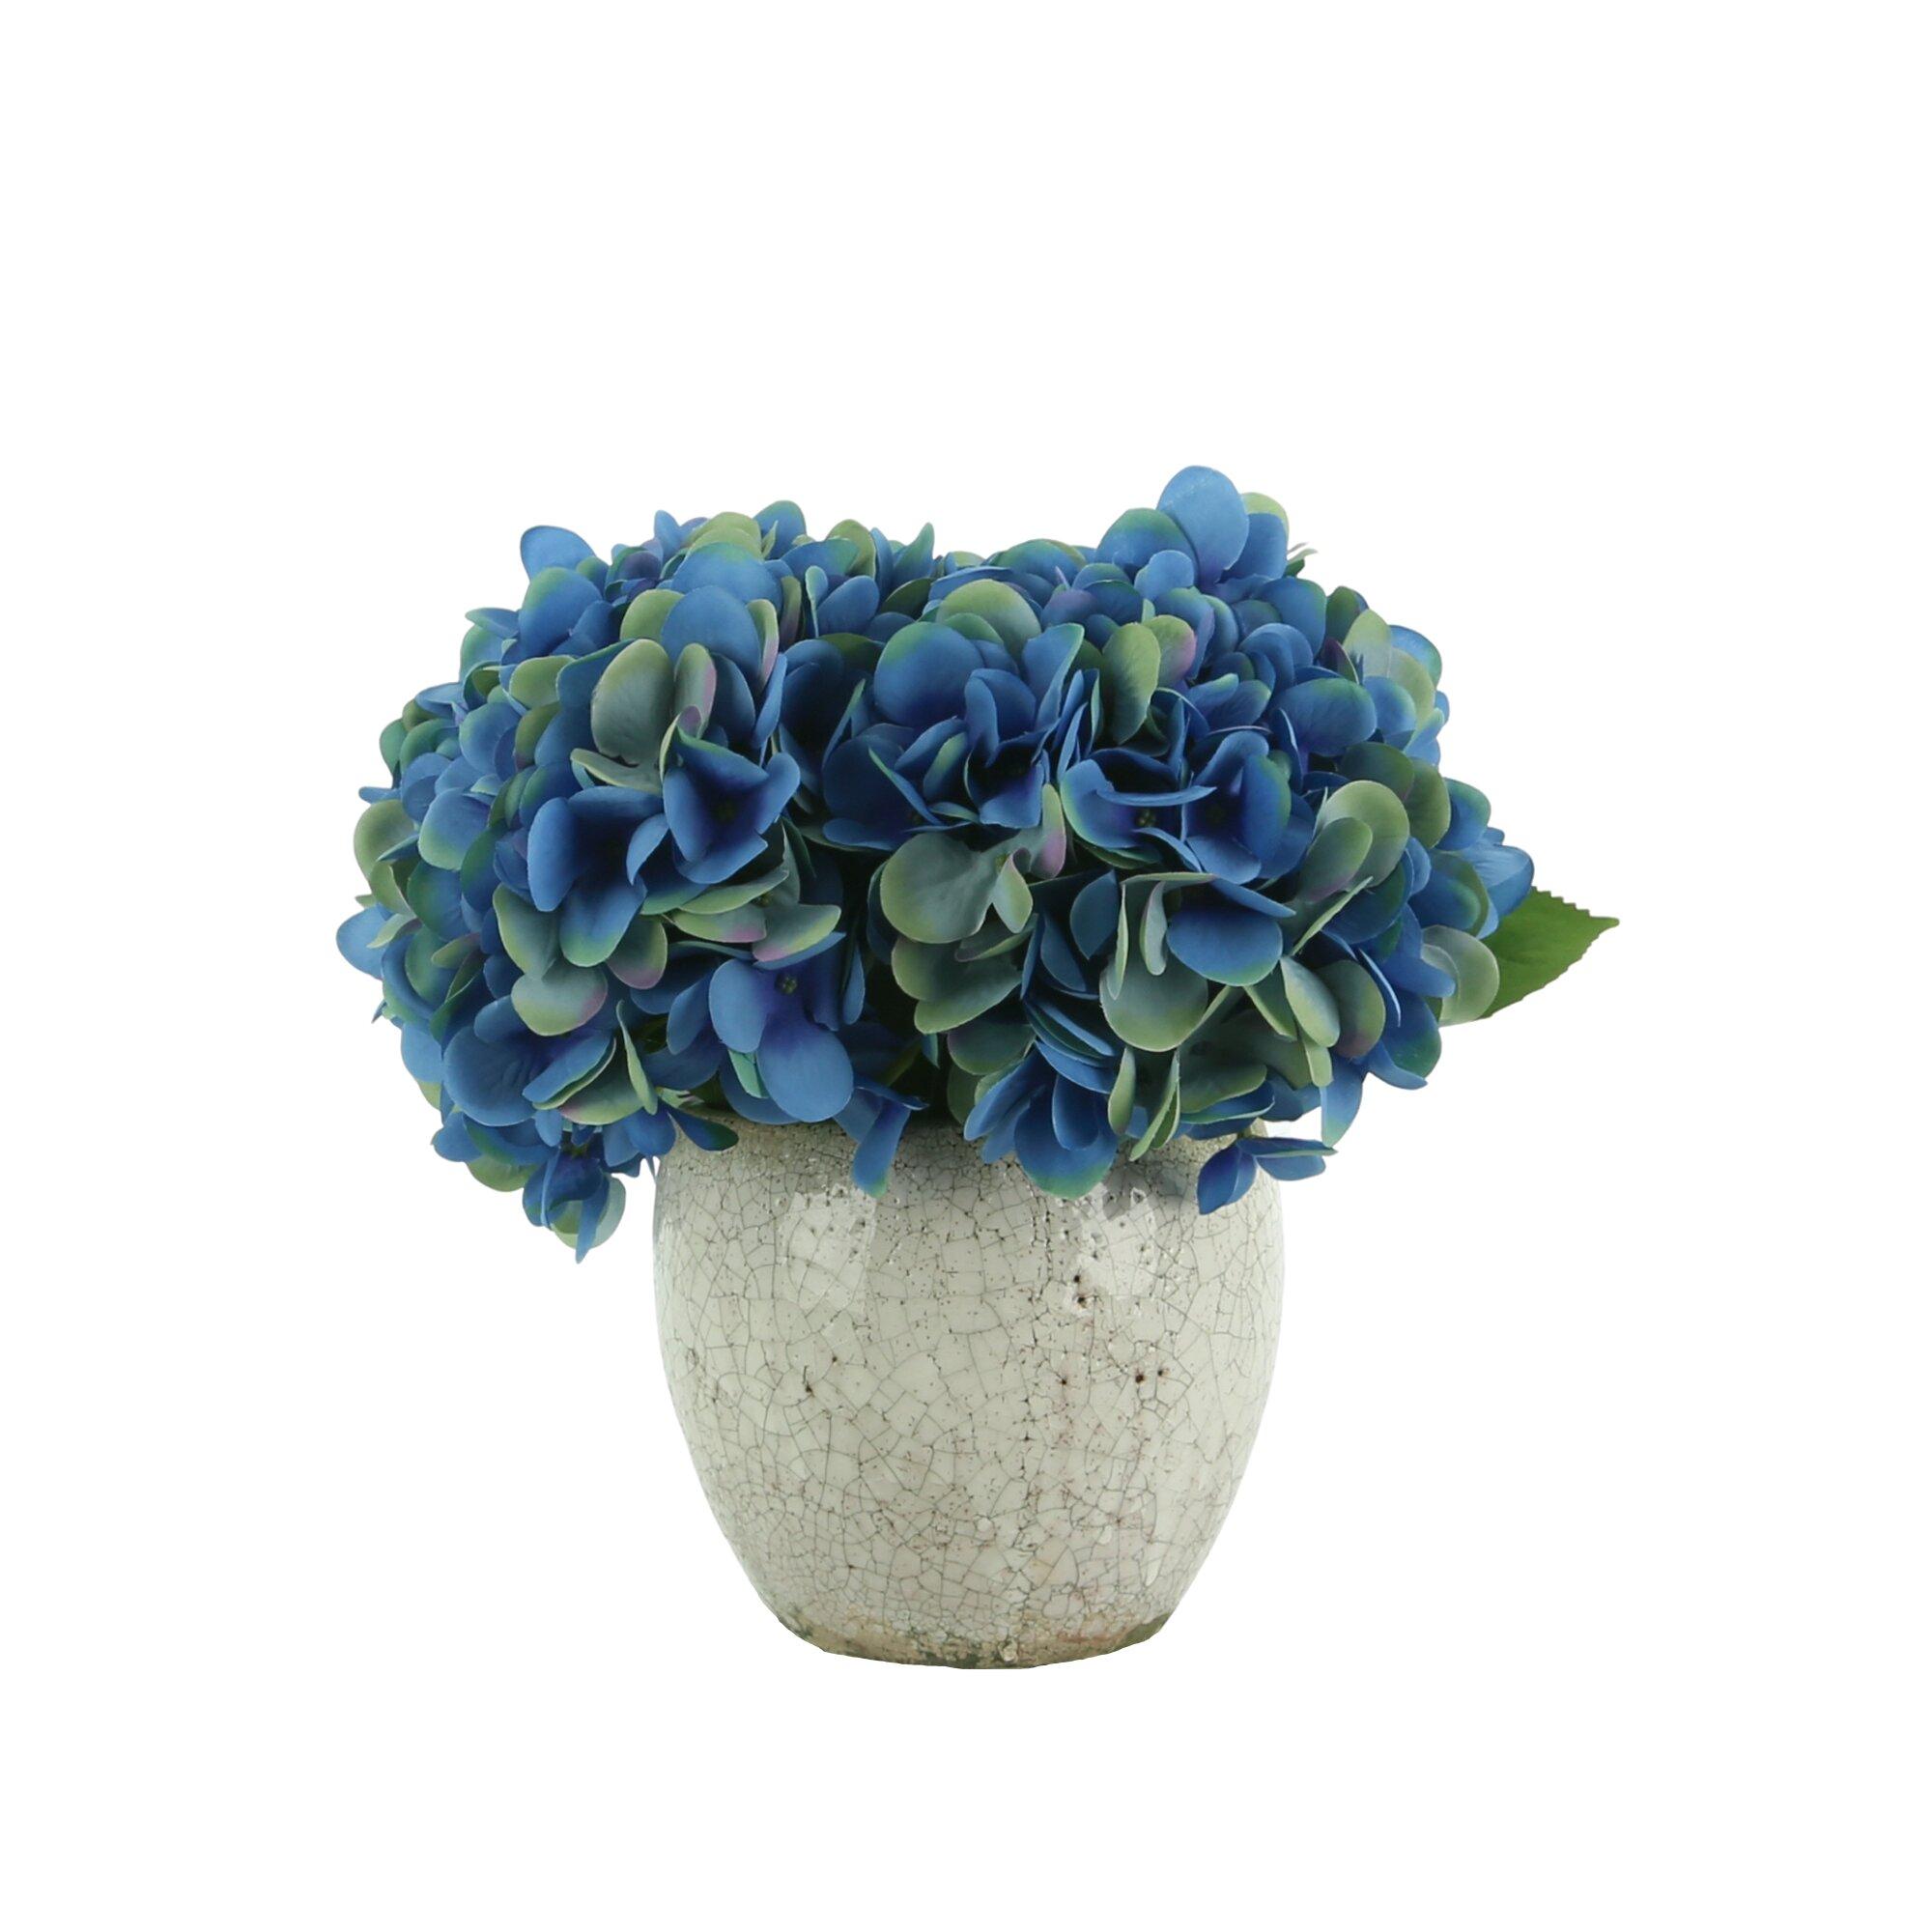 Primrue Hydrangea Centerpiece In Pot Wayfair